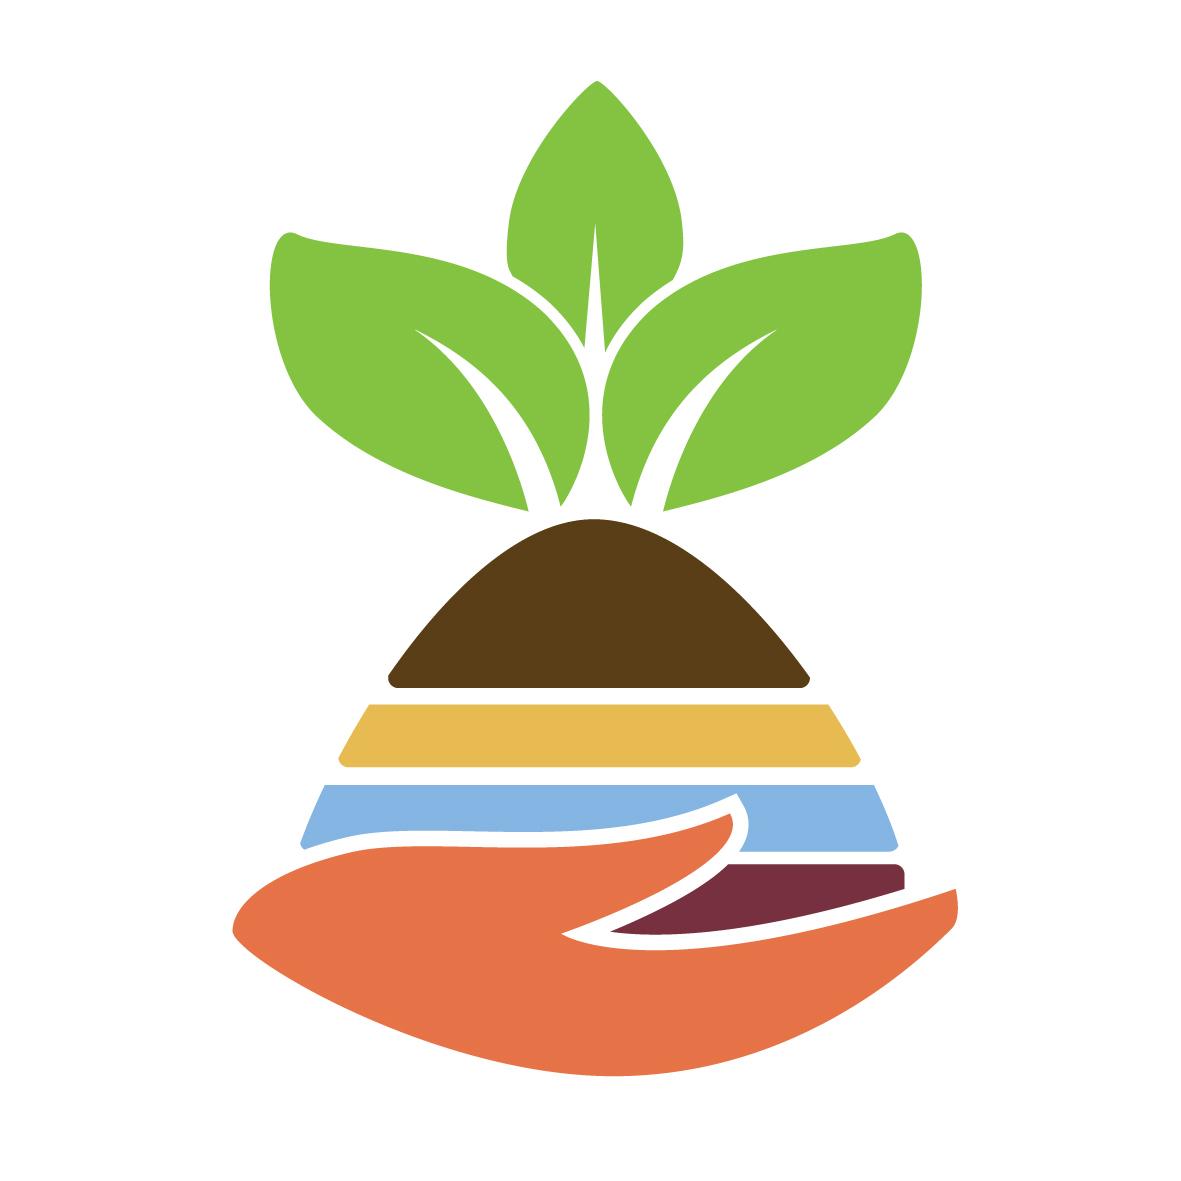 The International Year of Soils 2015 -